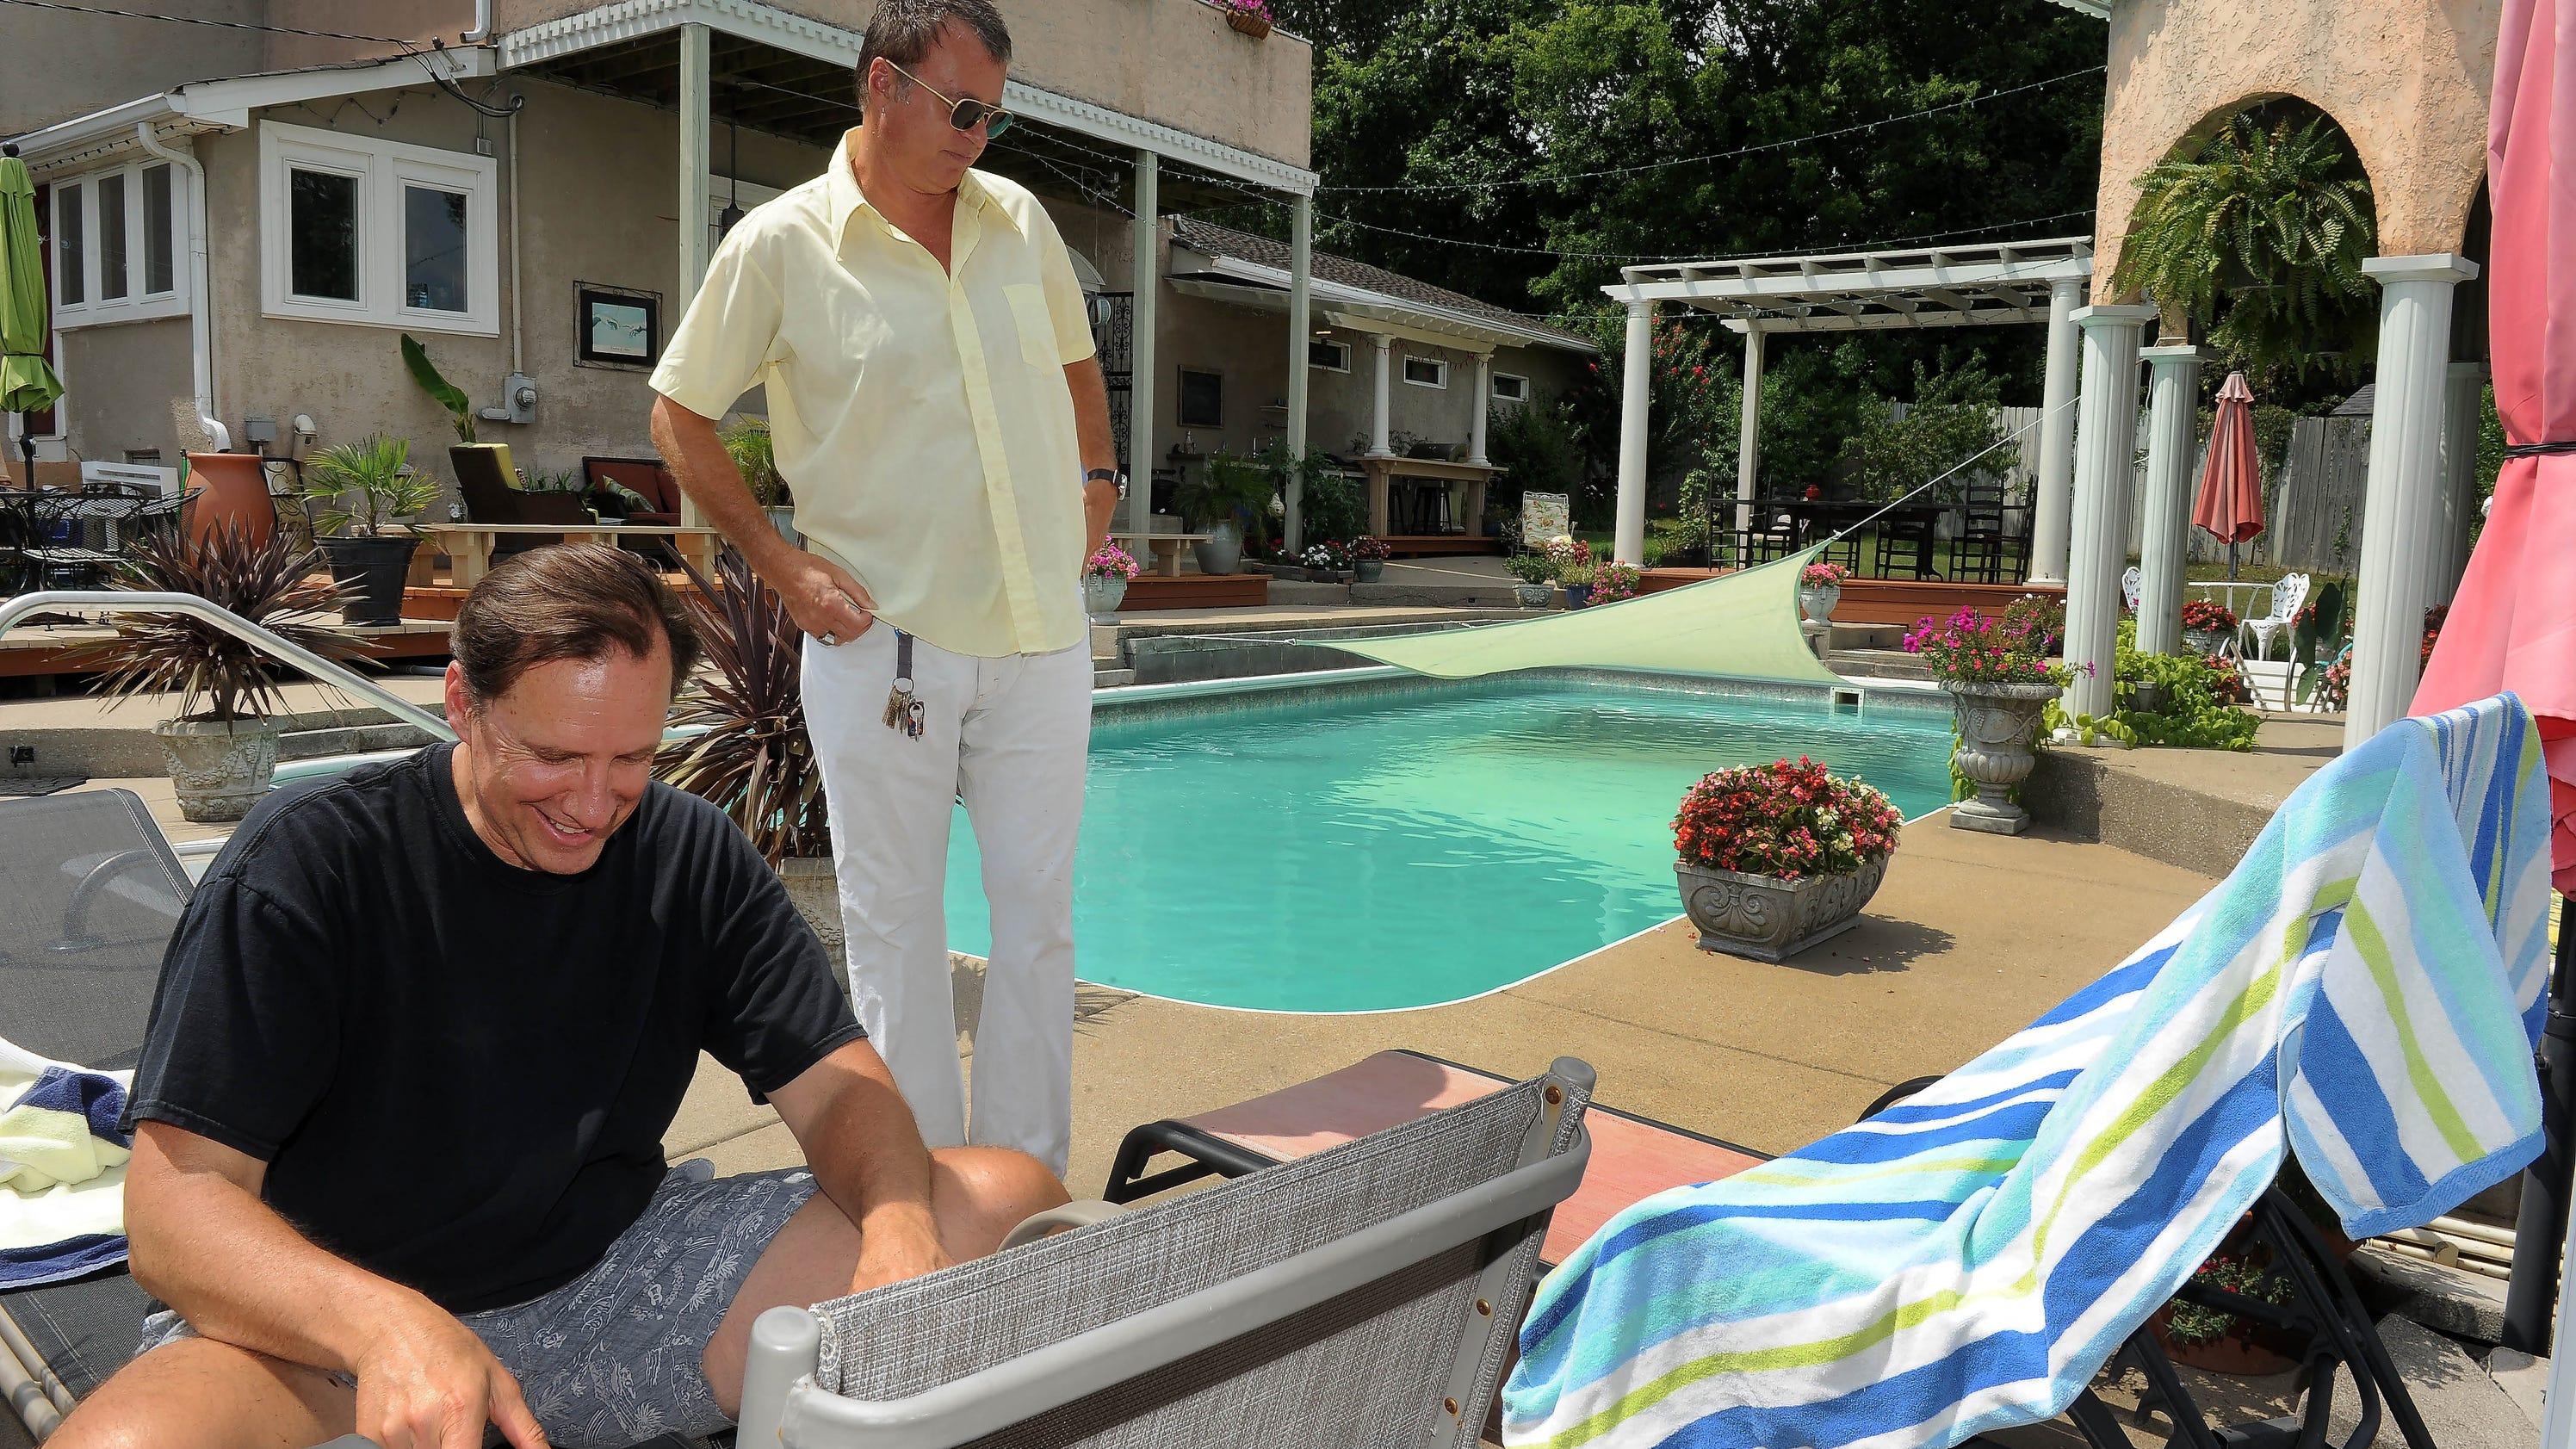 Metro Nashville Begins Taxing Airbnb Hosts